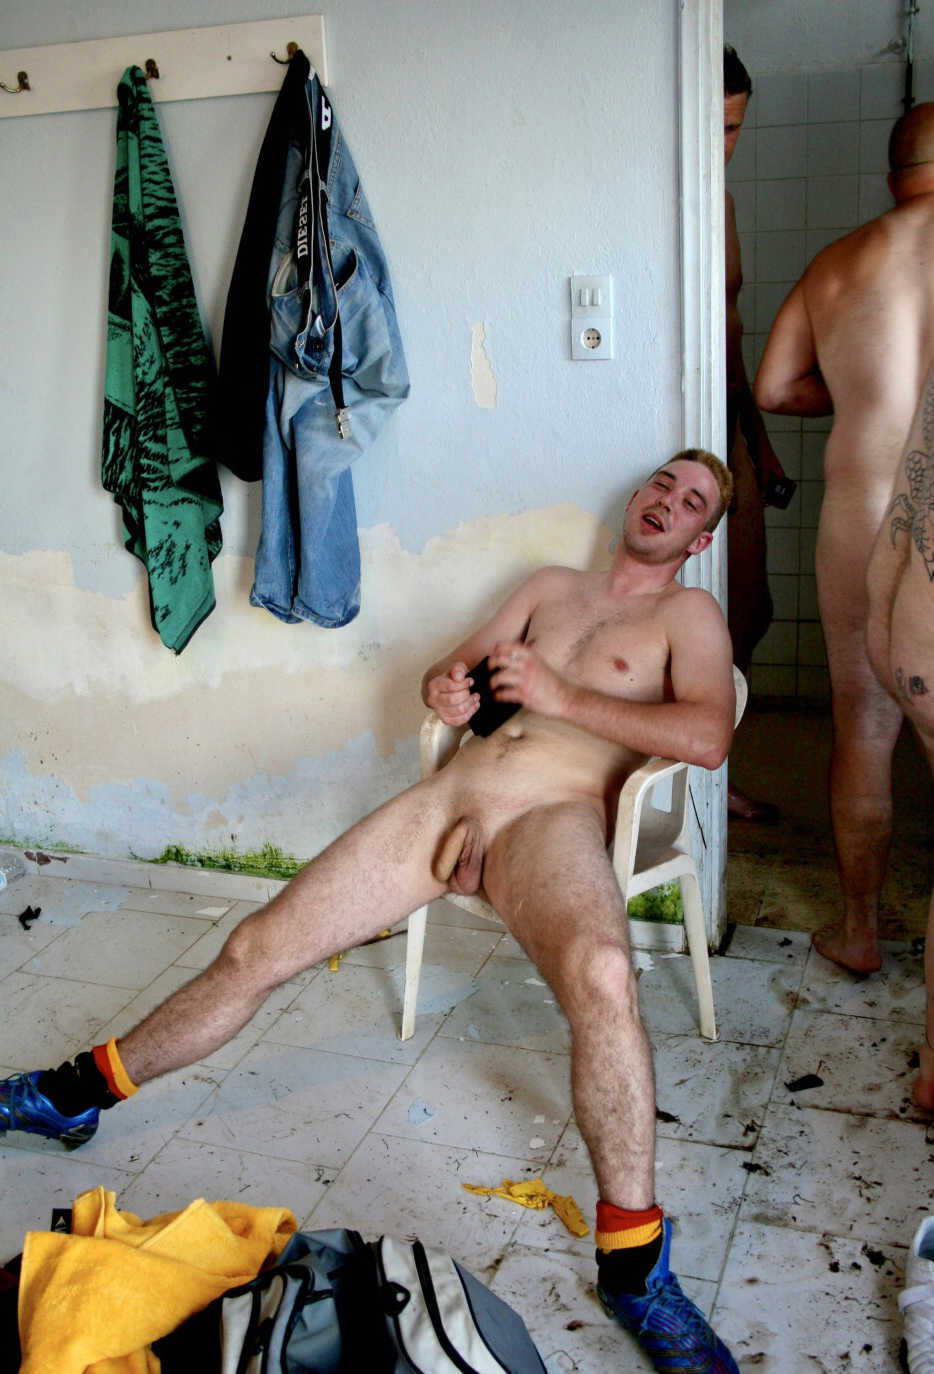 naked guy spreading legs in locker room